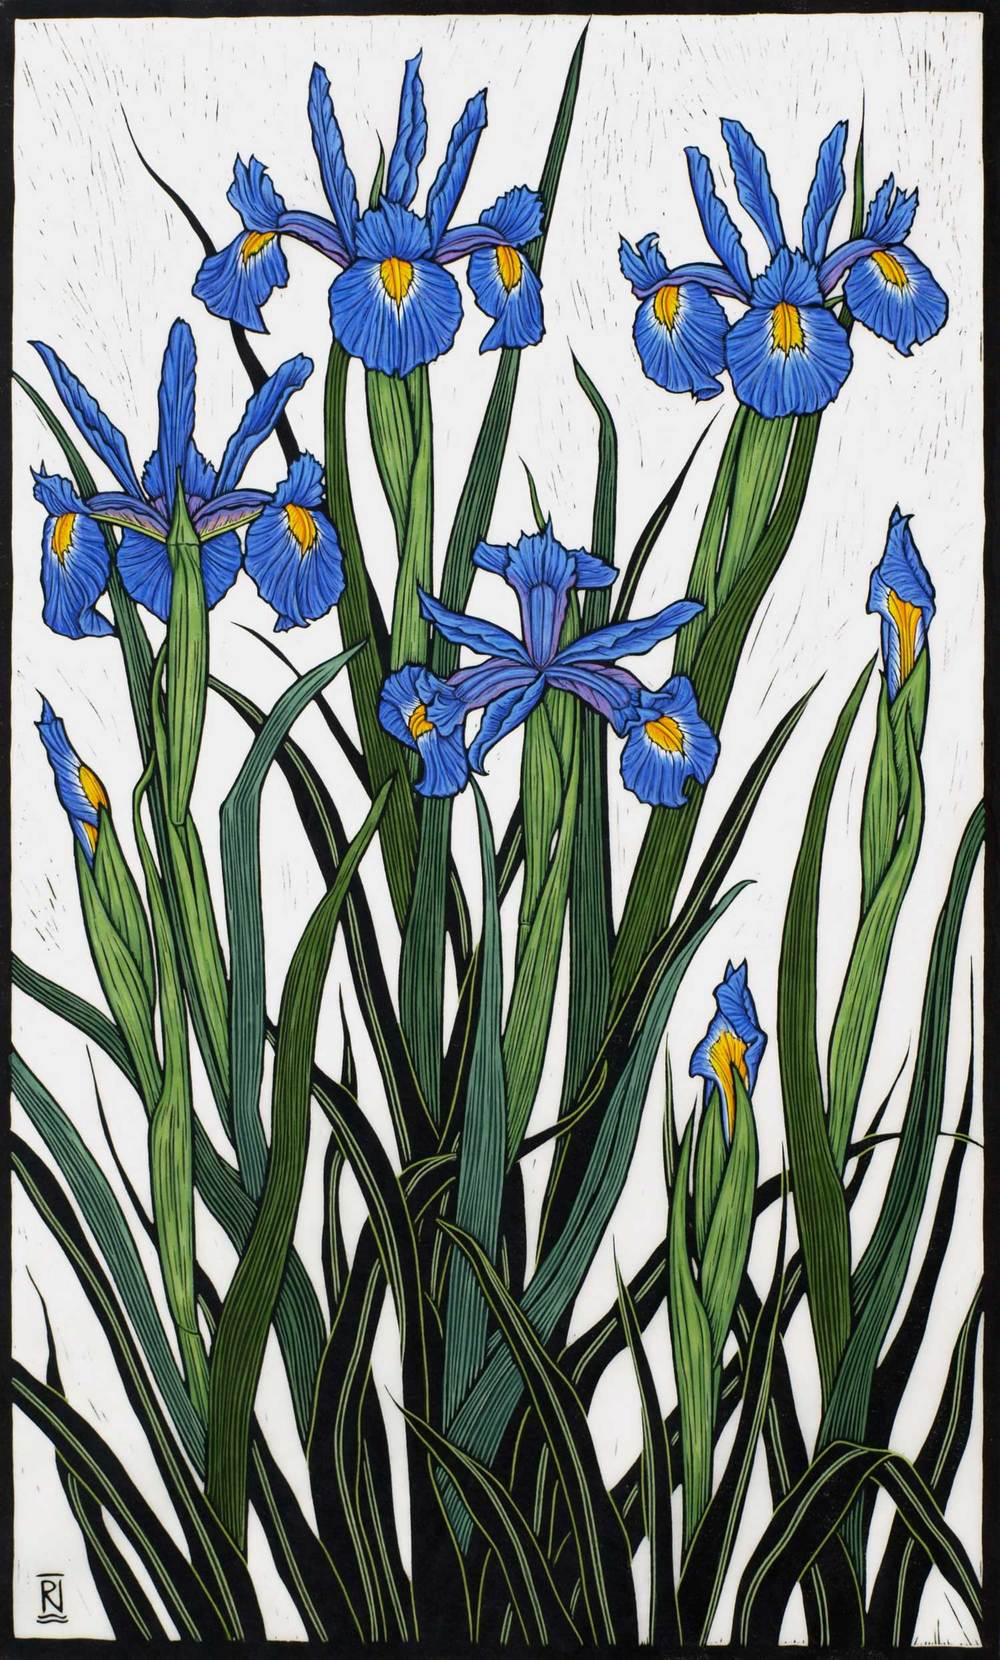 irises-linocut-rachel-newling.jpg